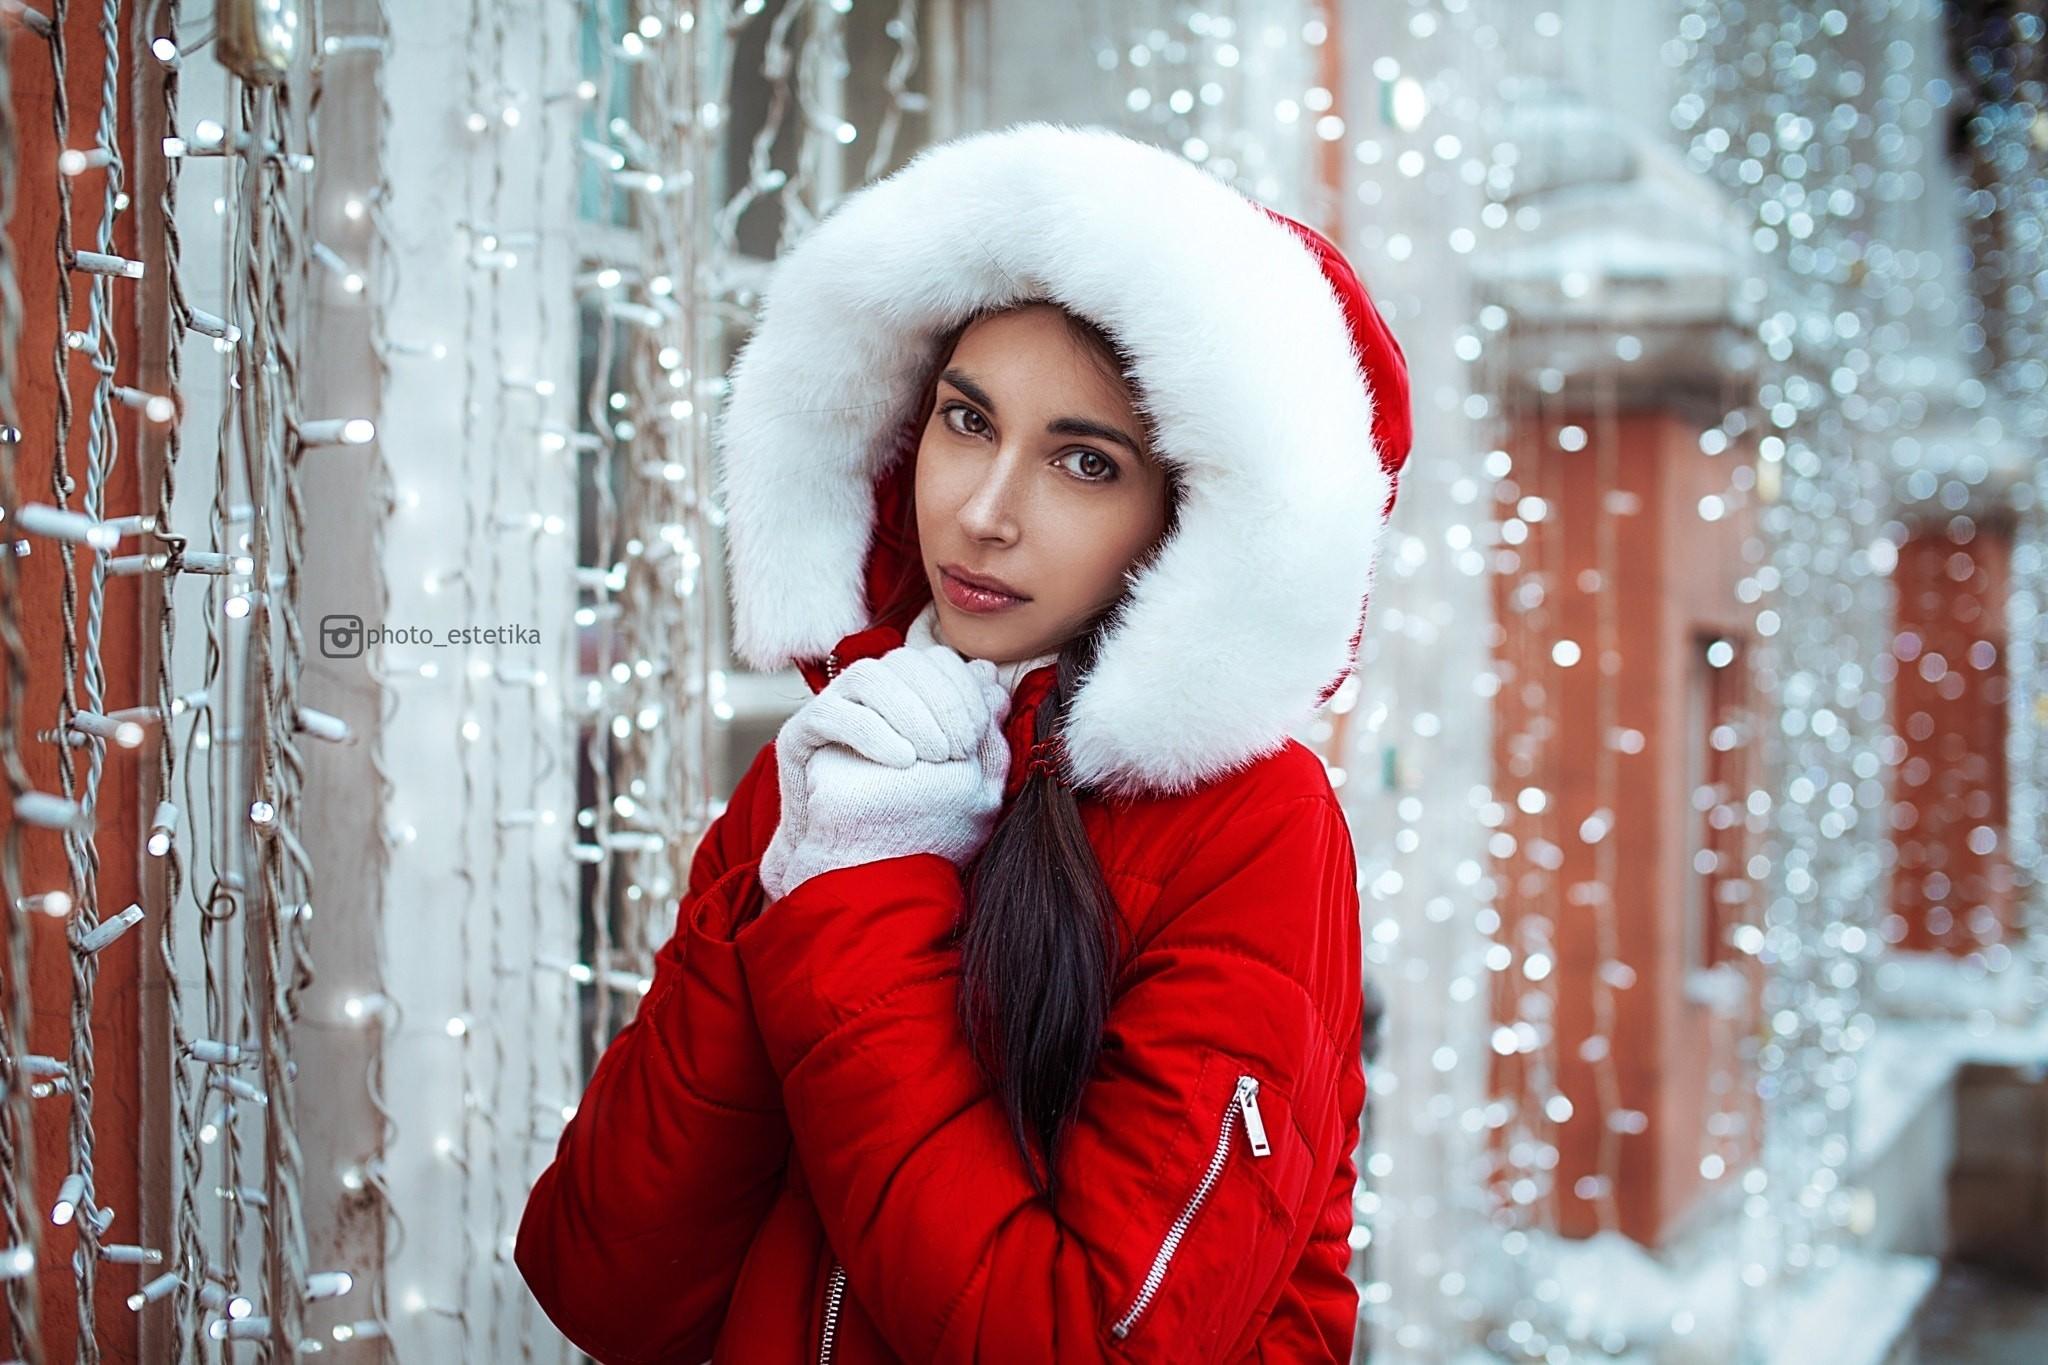 1918006b59dc7 women portrait depth of field red snow winter dress gloves hoods sweater  Christmas holiday Santa Claus